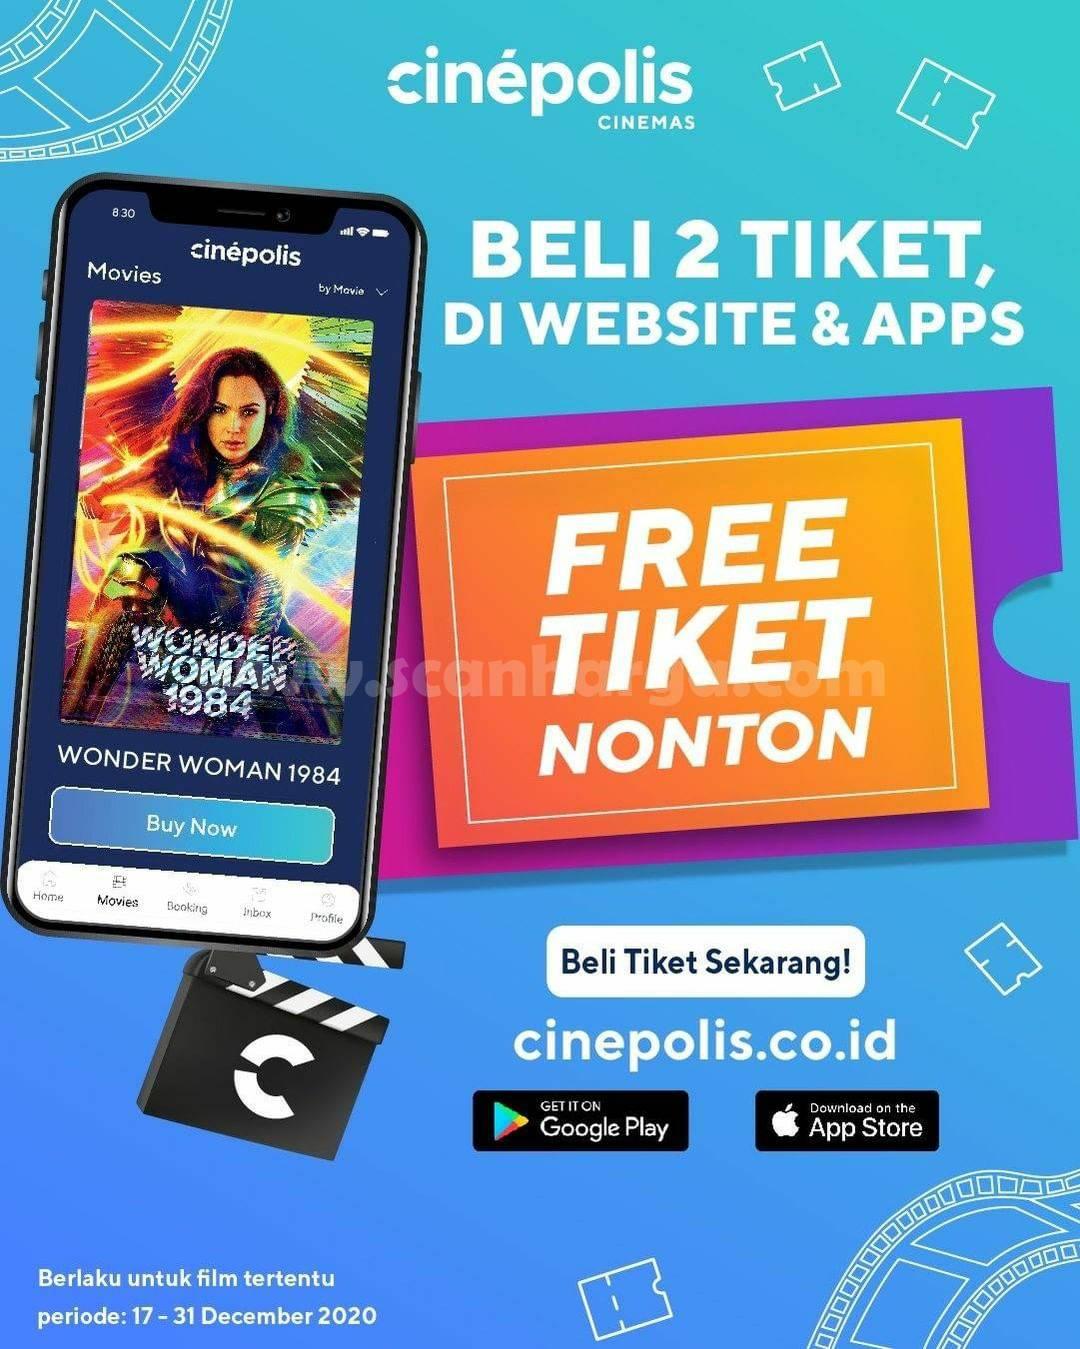 CINEPOLIS Promo Beli 2 Tiket di Website & Apps – GRATIS TIKET NONTON!